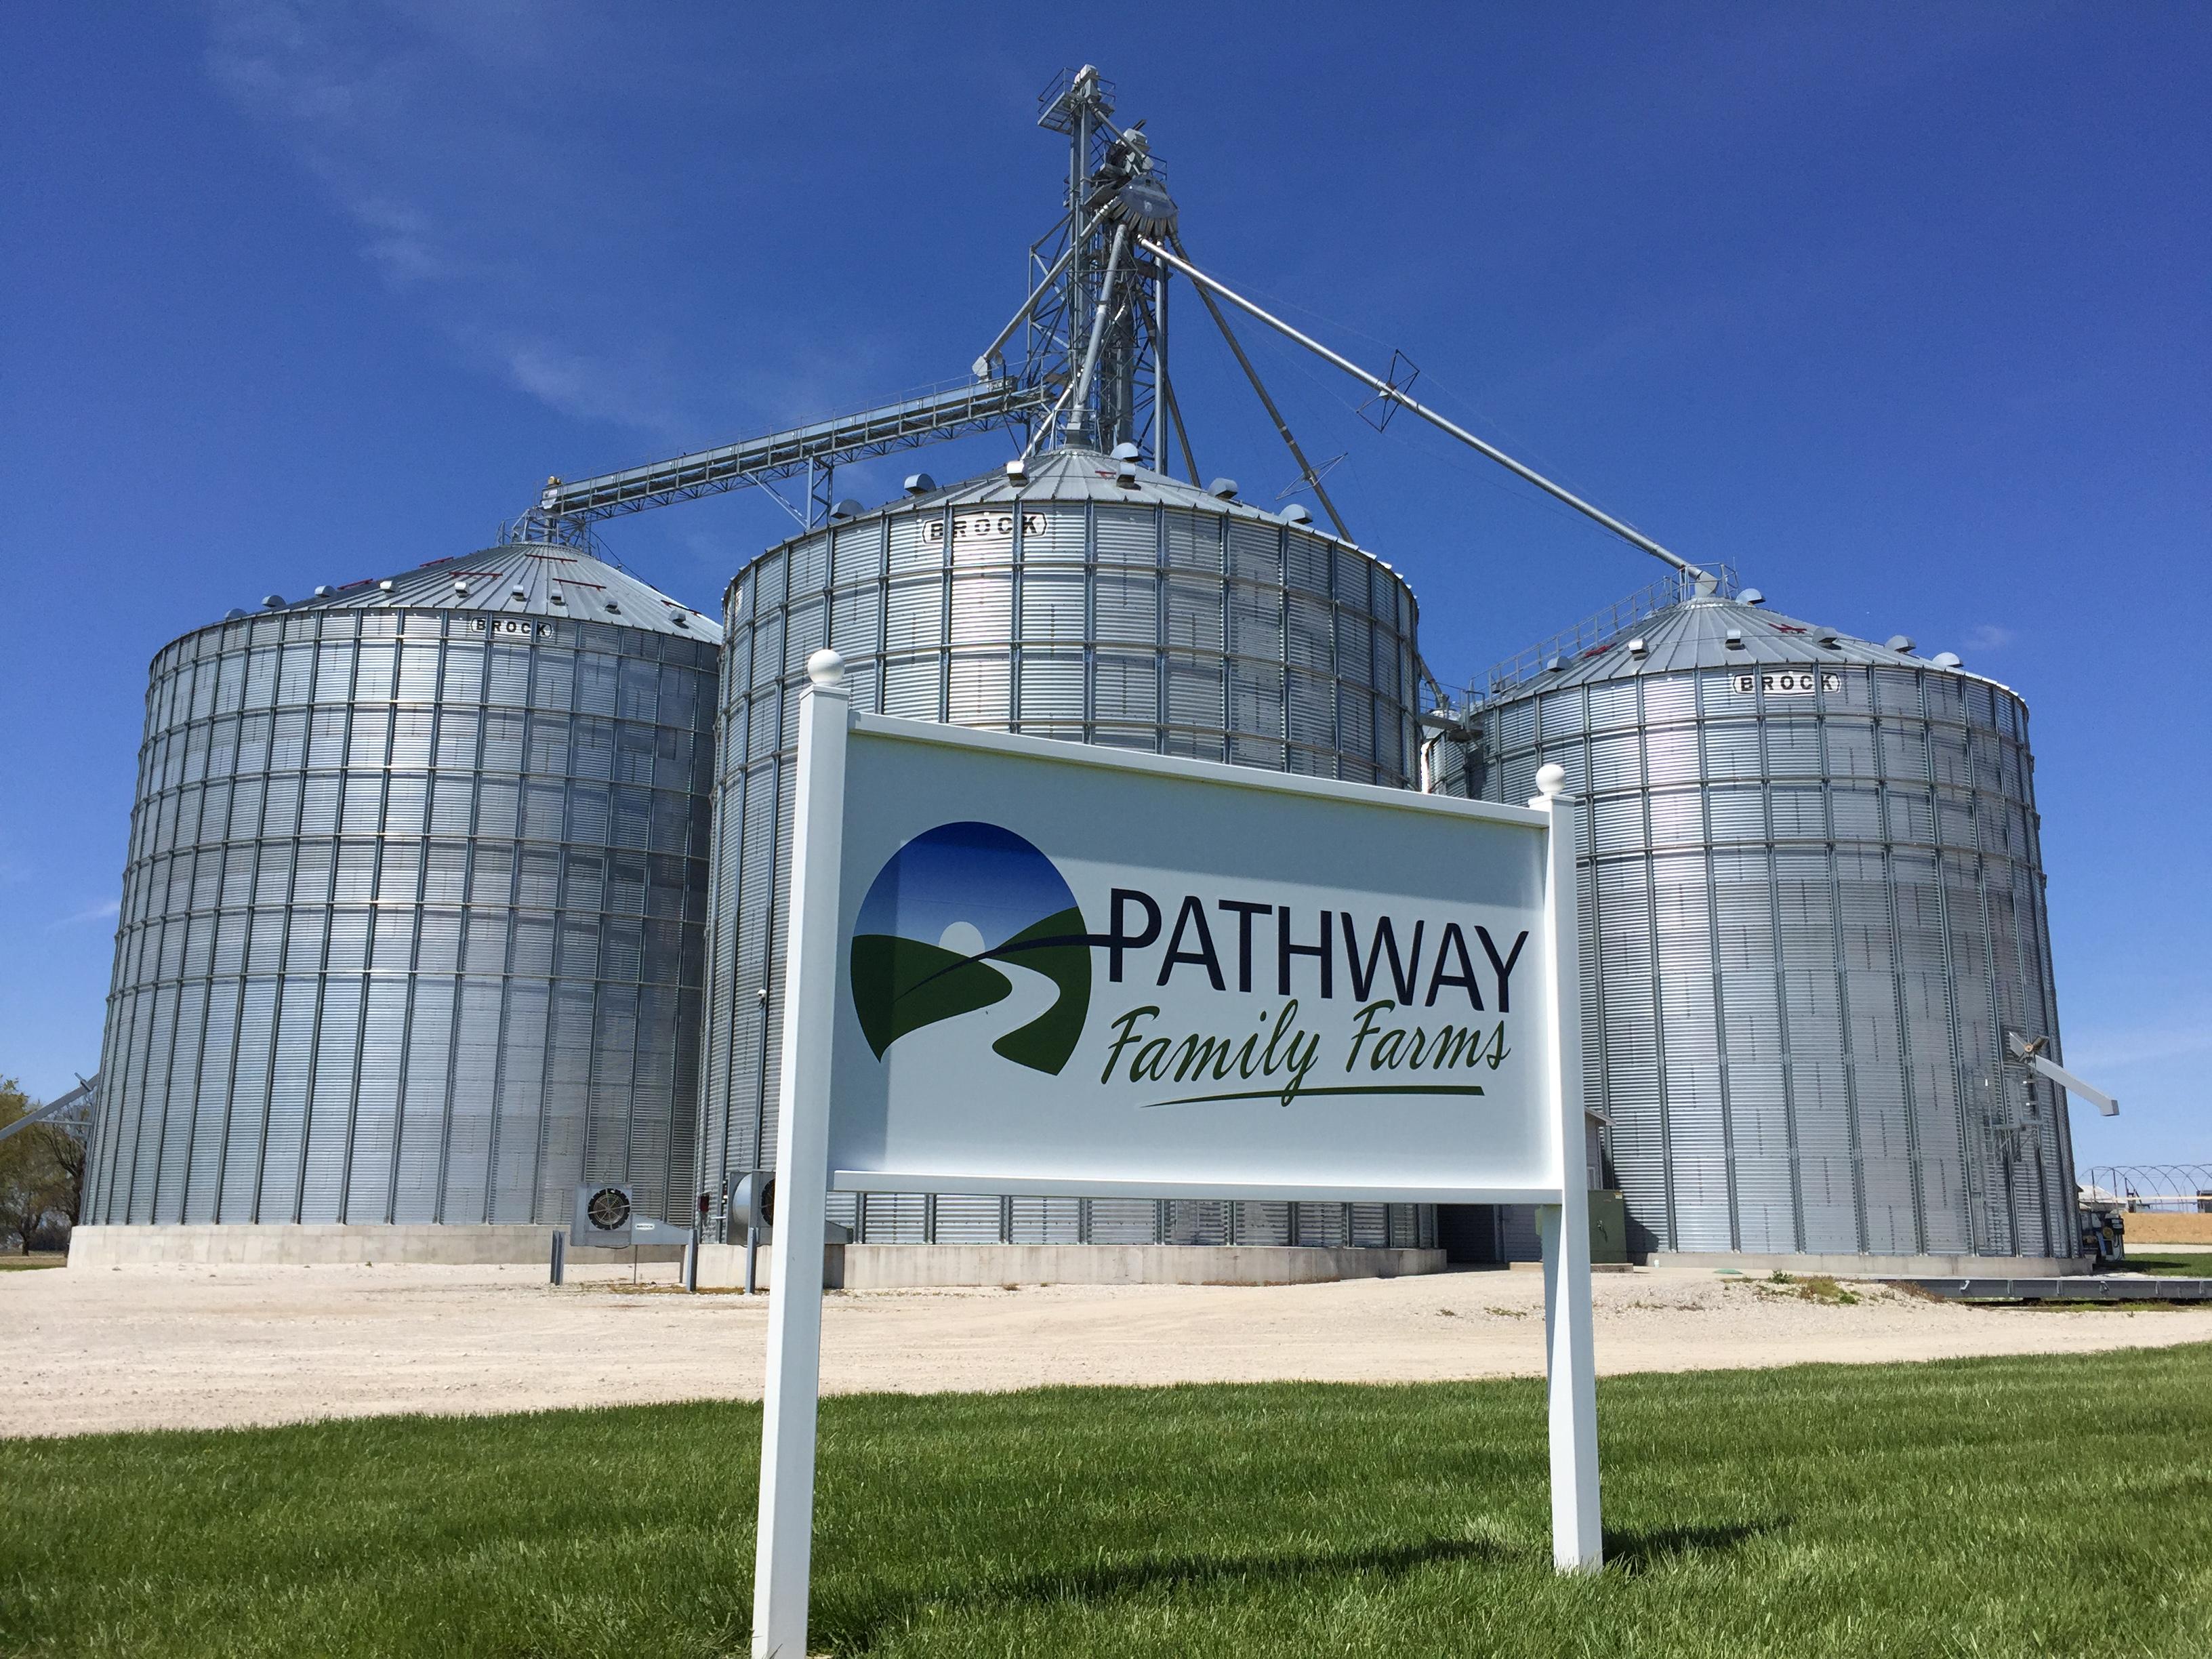 Pathway Family Farms Grain Bins